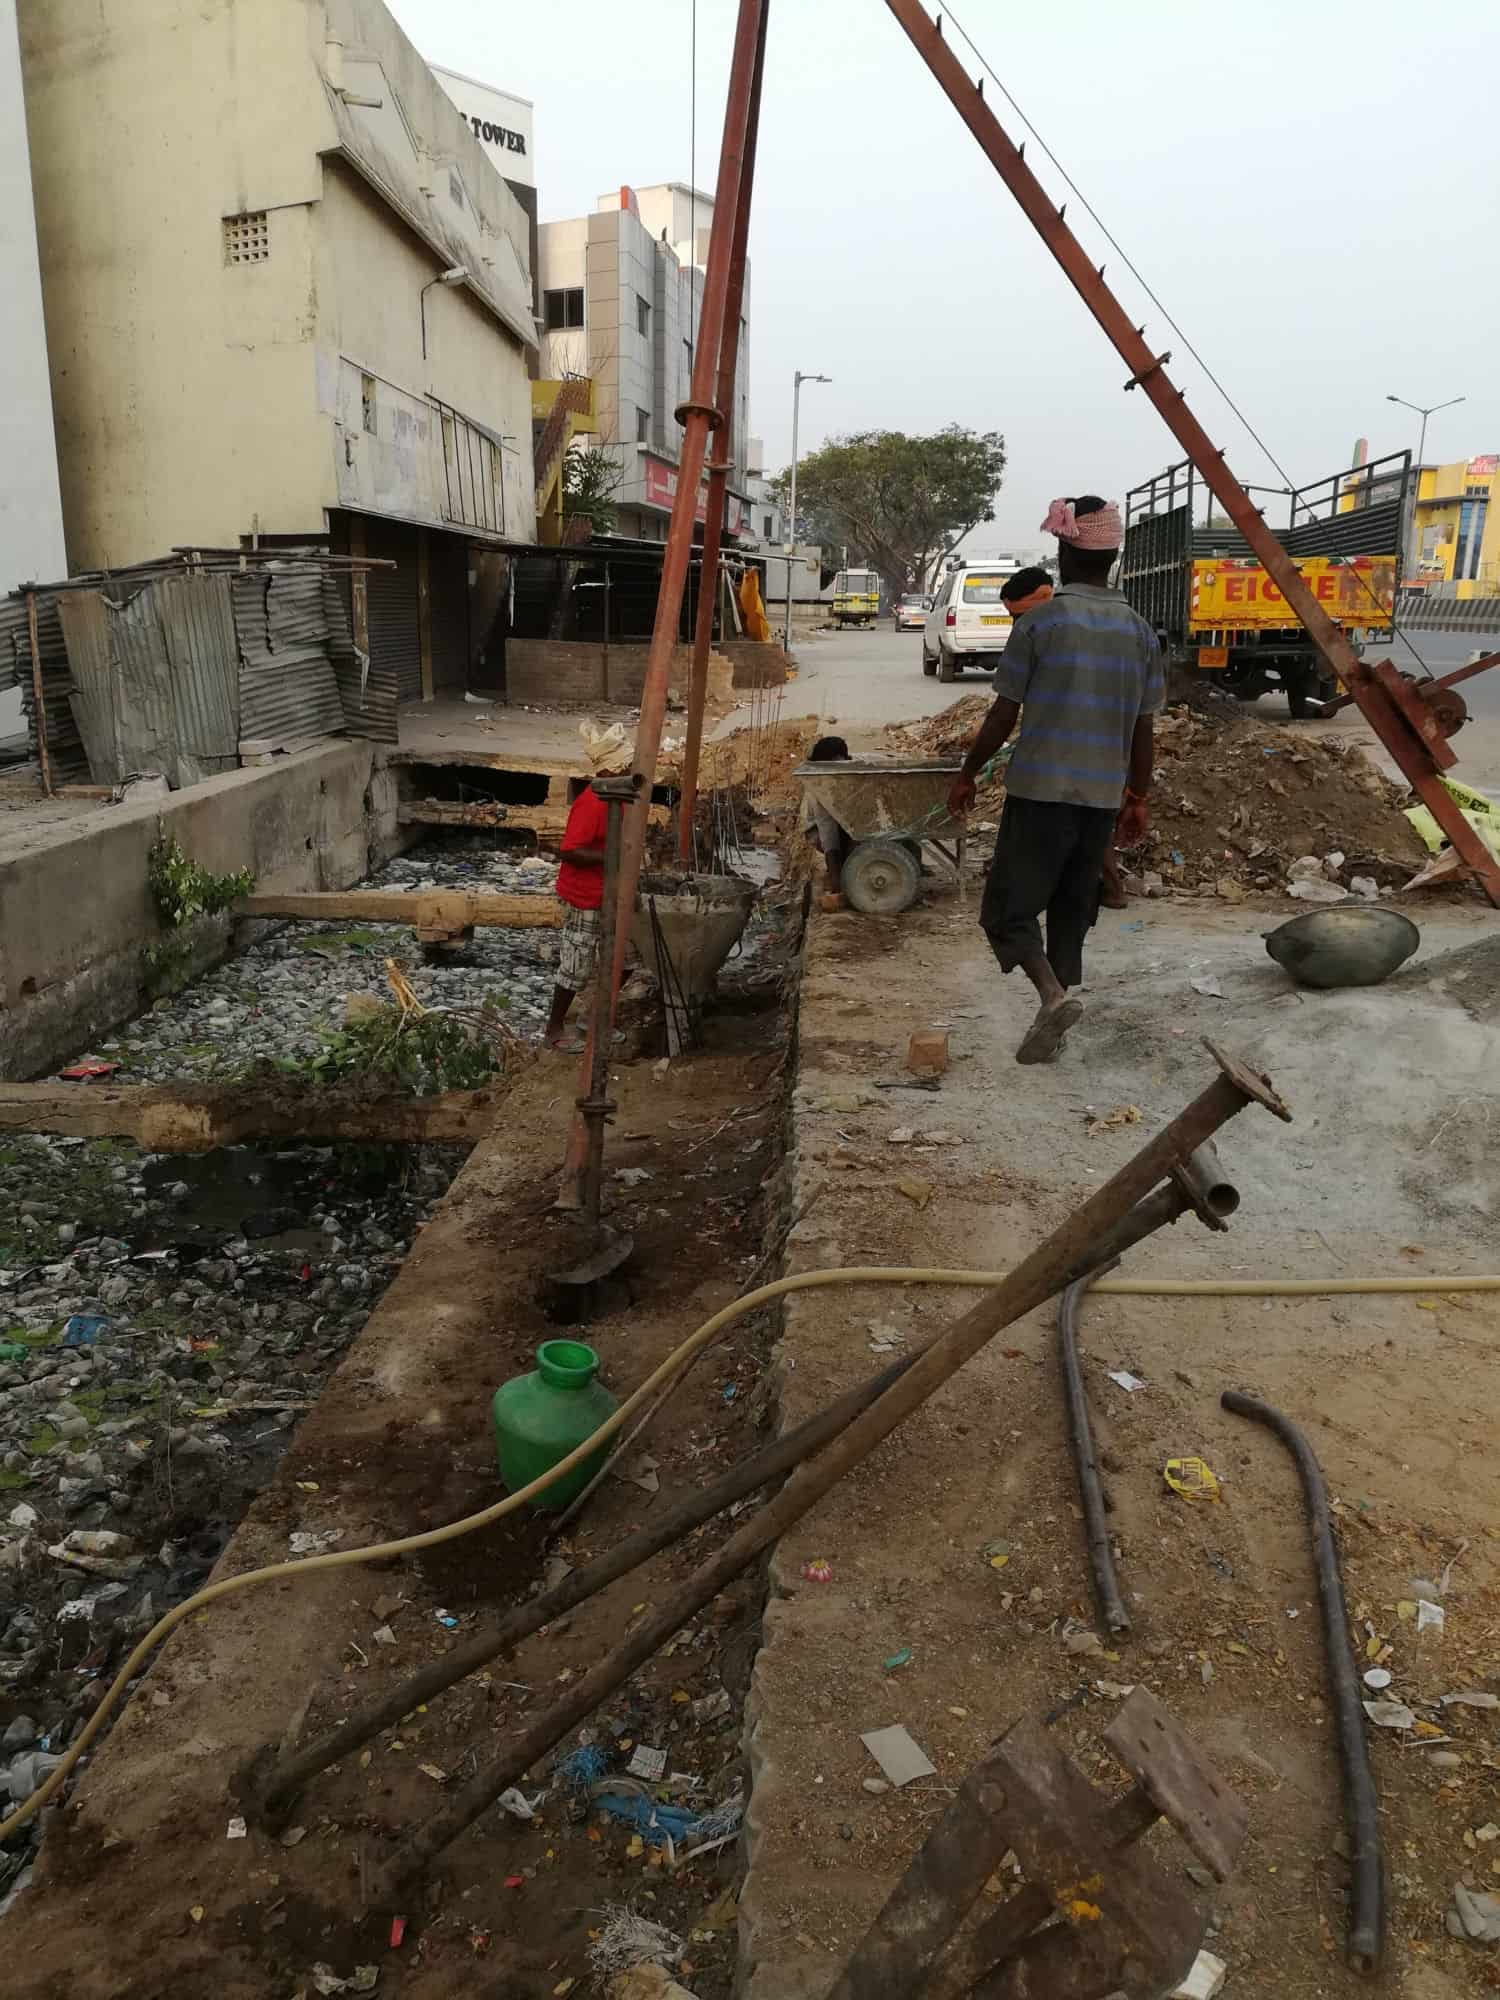 Vijay pile foundations anna nagar veejay pile foundations vijay pile foundations anna nagar veejay pile foundations piling contractors in chennai justdial solutioingenieria Image collections